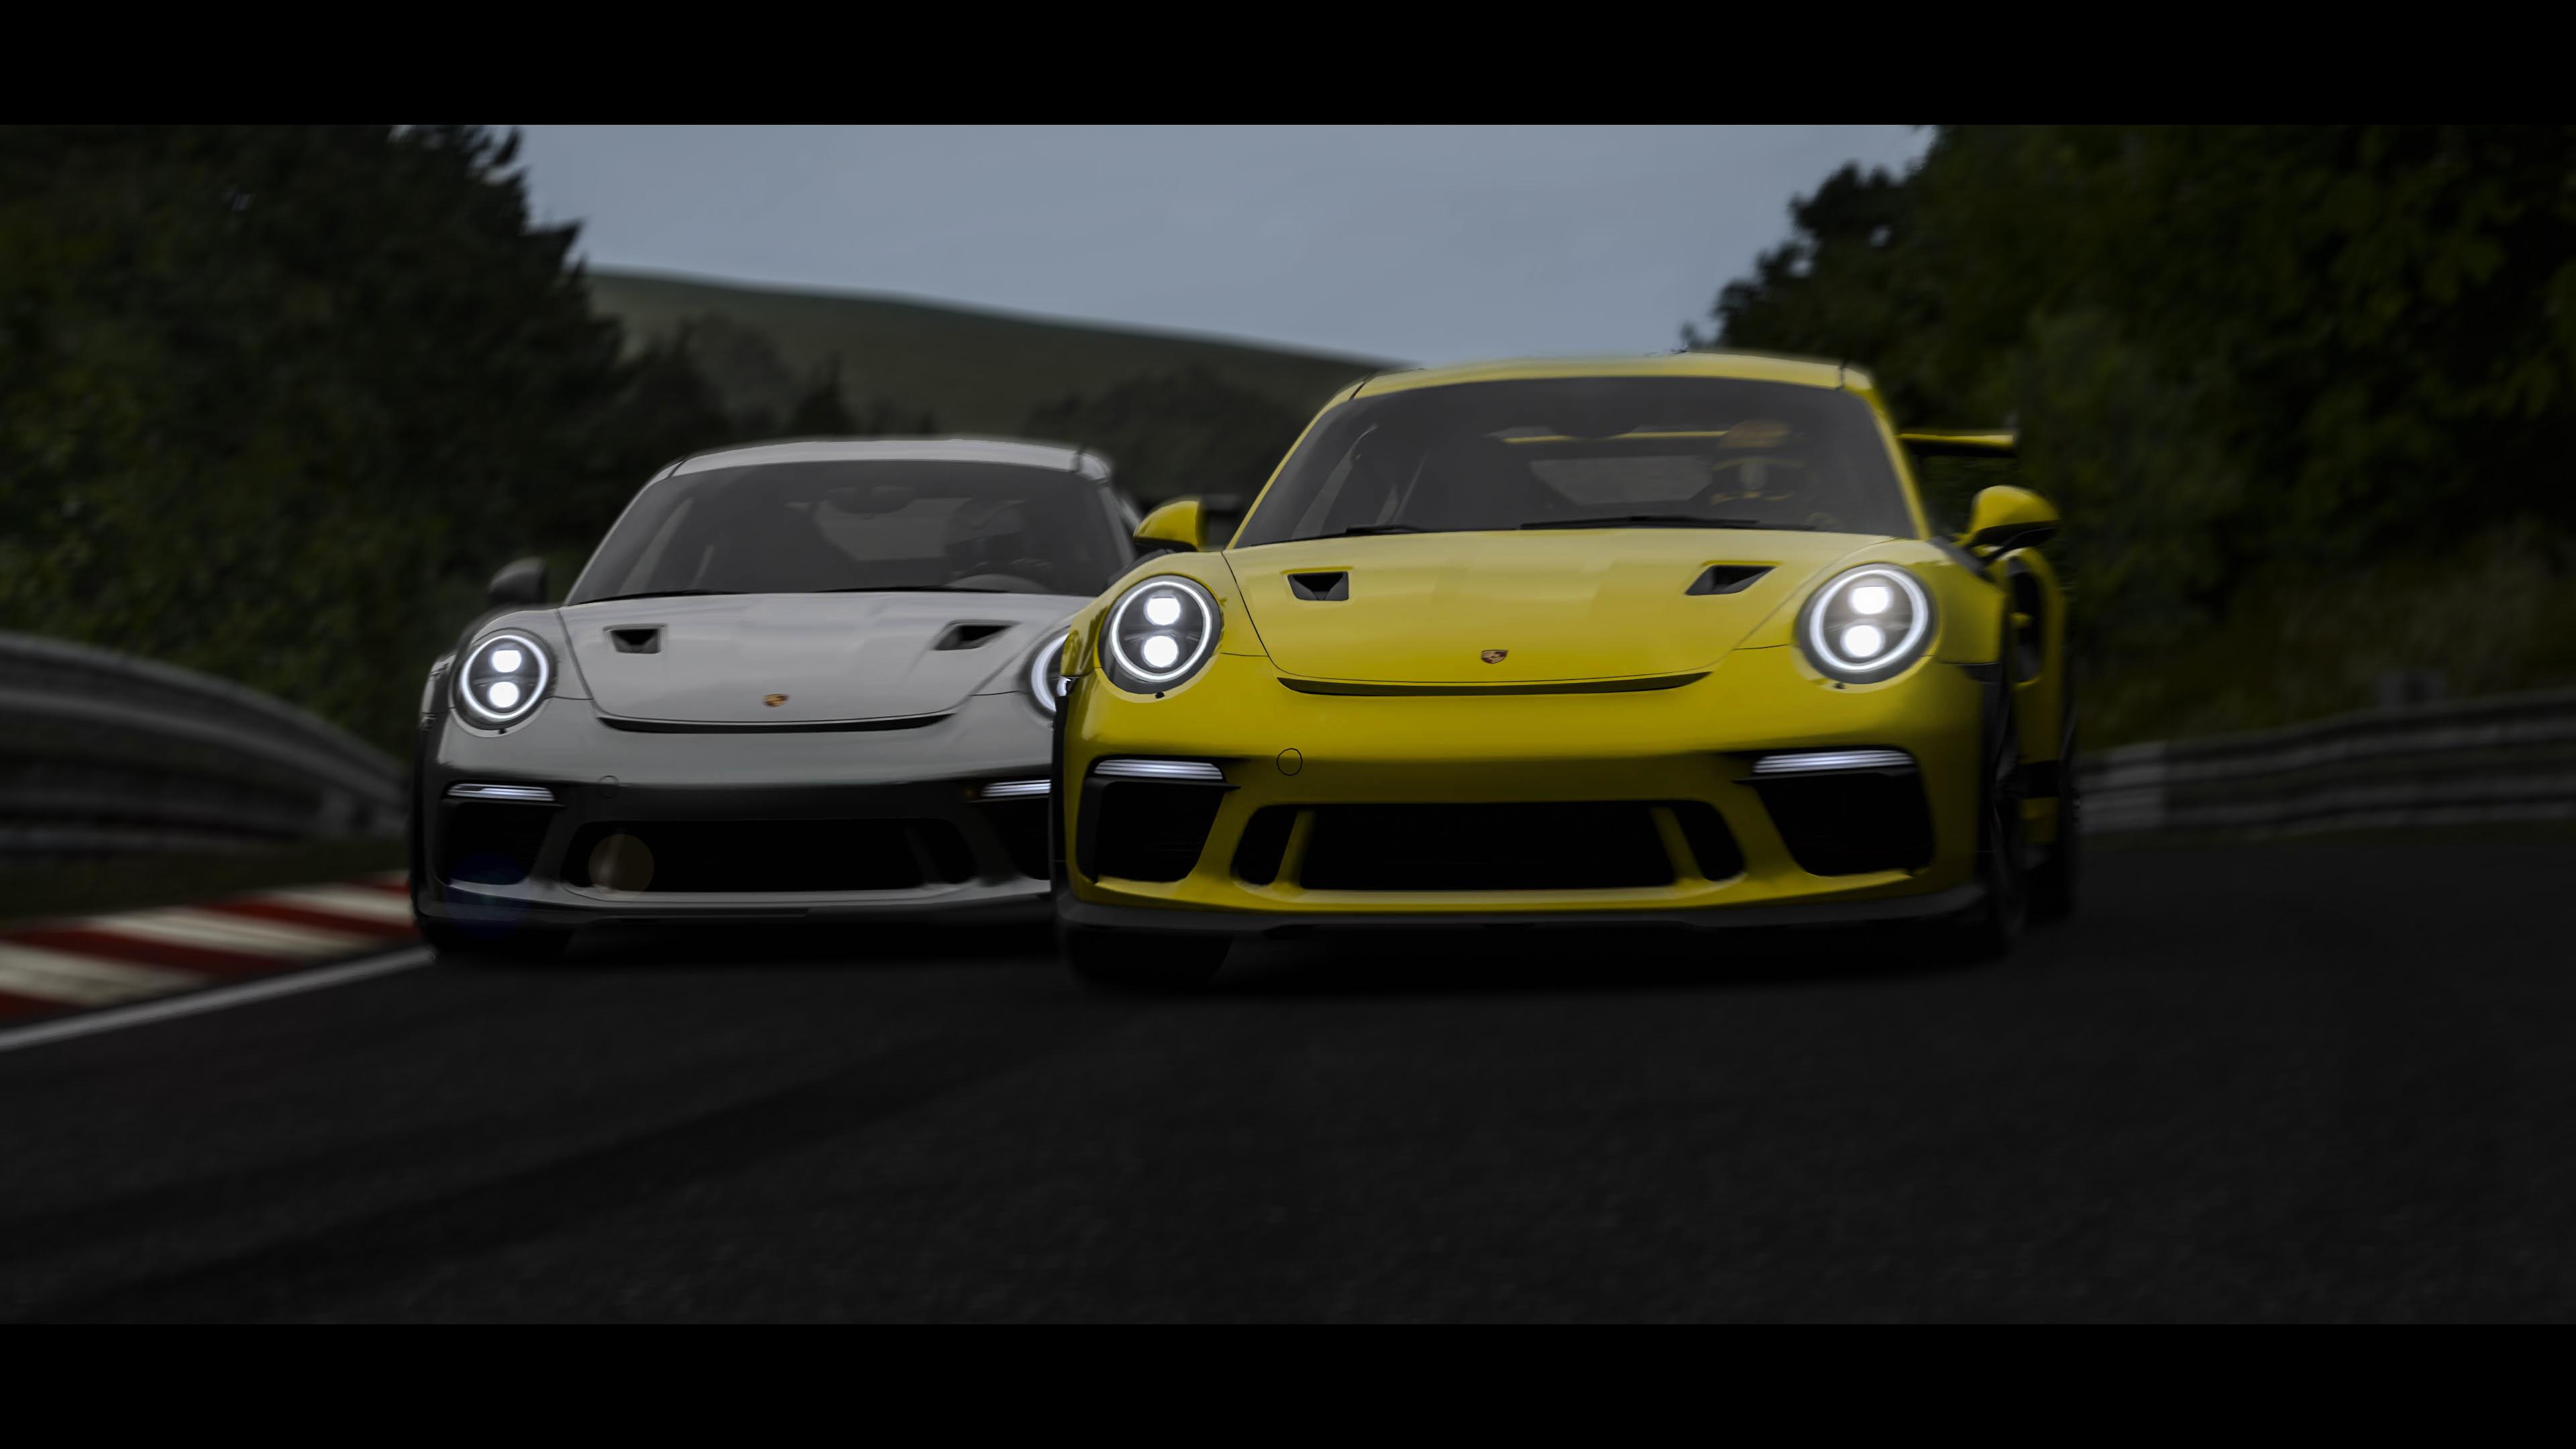 43886232282_c72b104512_o ForzaMotorsport.fr